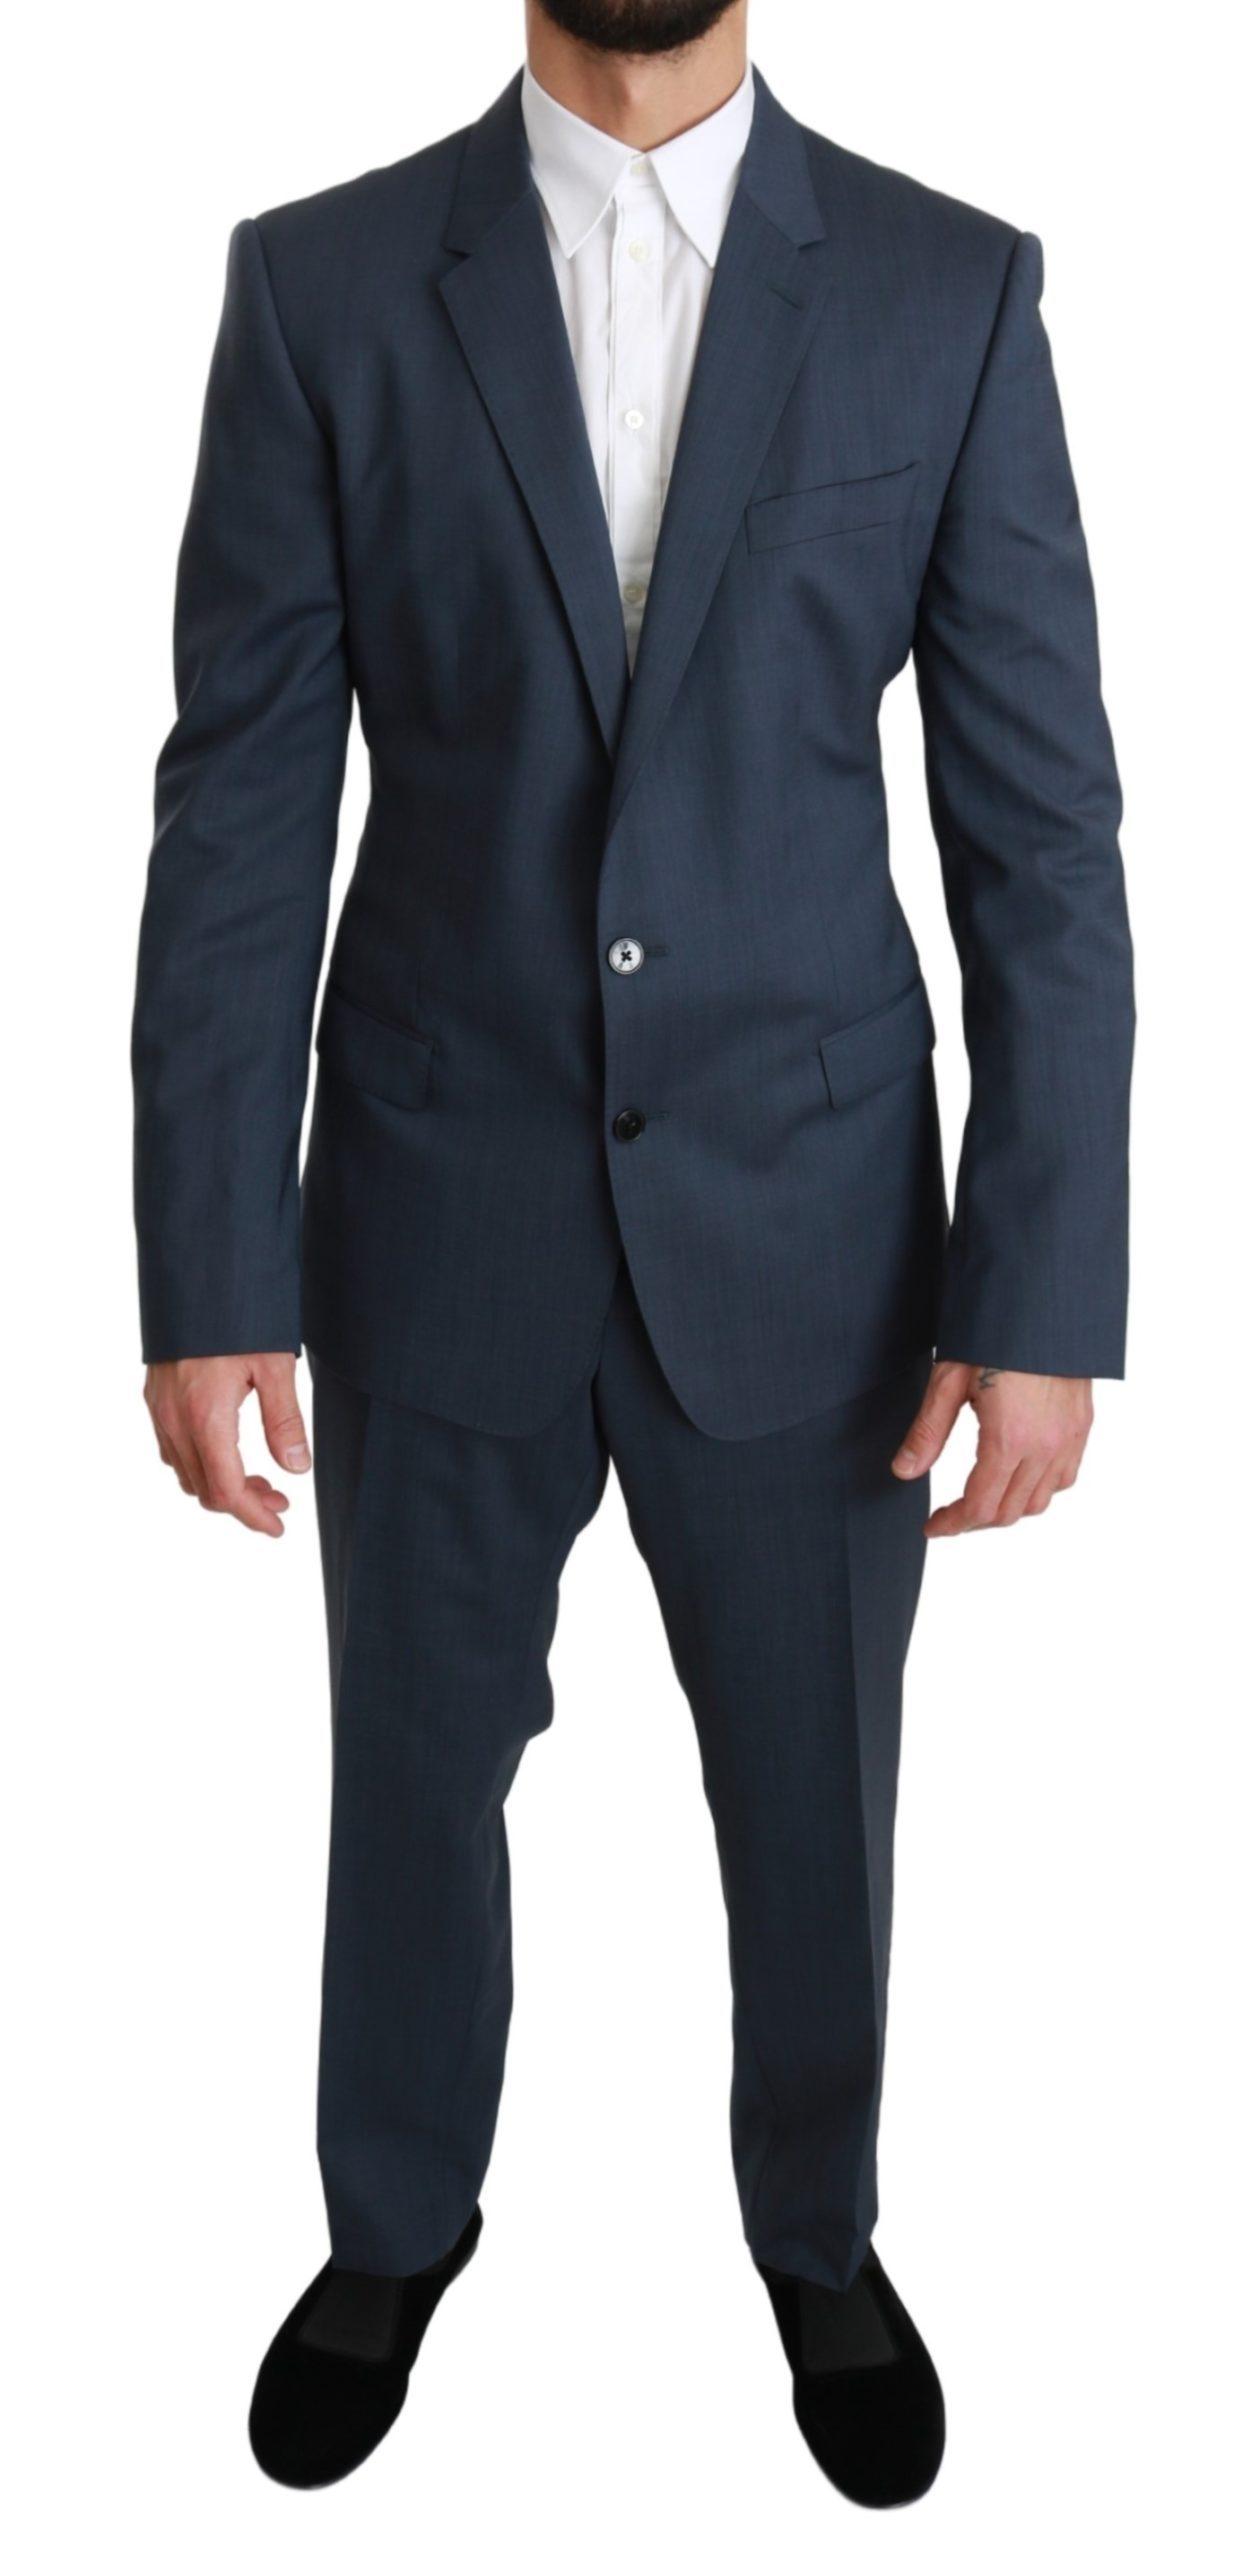 Dolce & Gabbana Men's Wool MARTINI Stretch 2 Piece Suit Blue KOS1667 - IT54 | XL